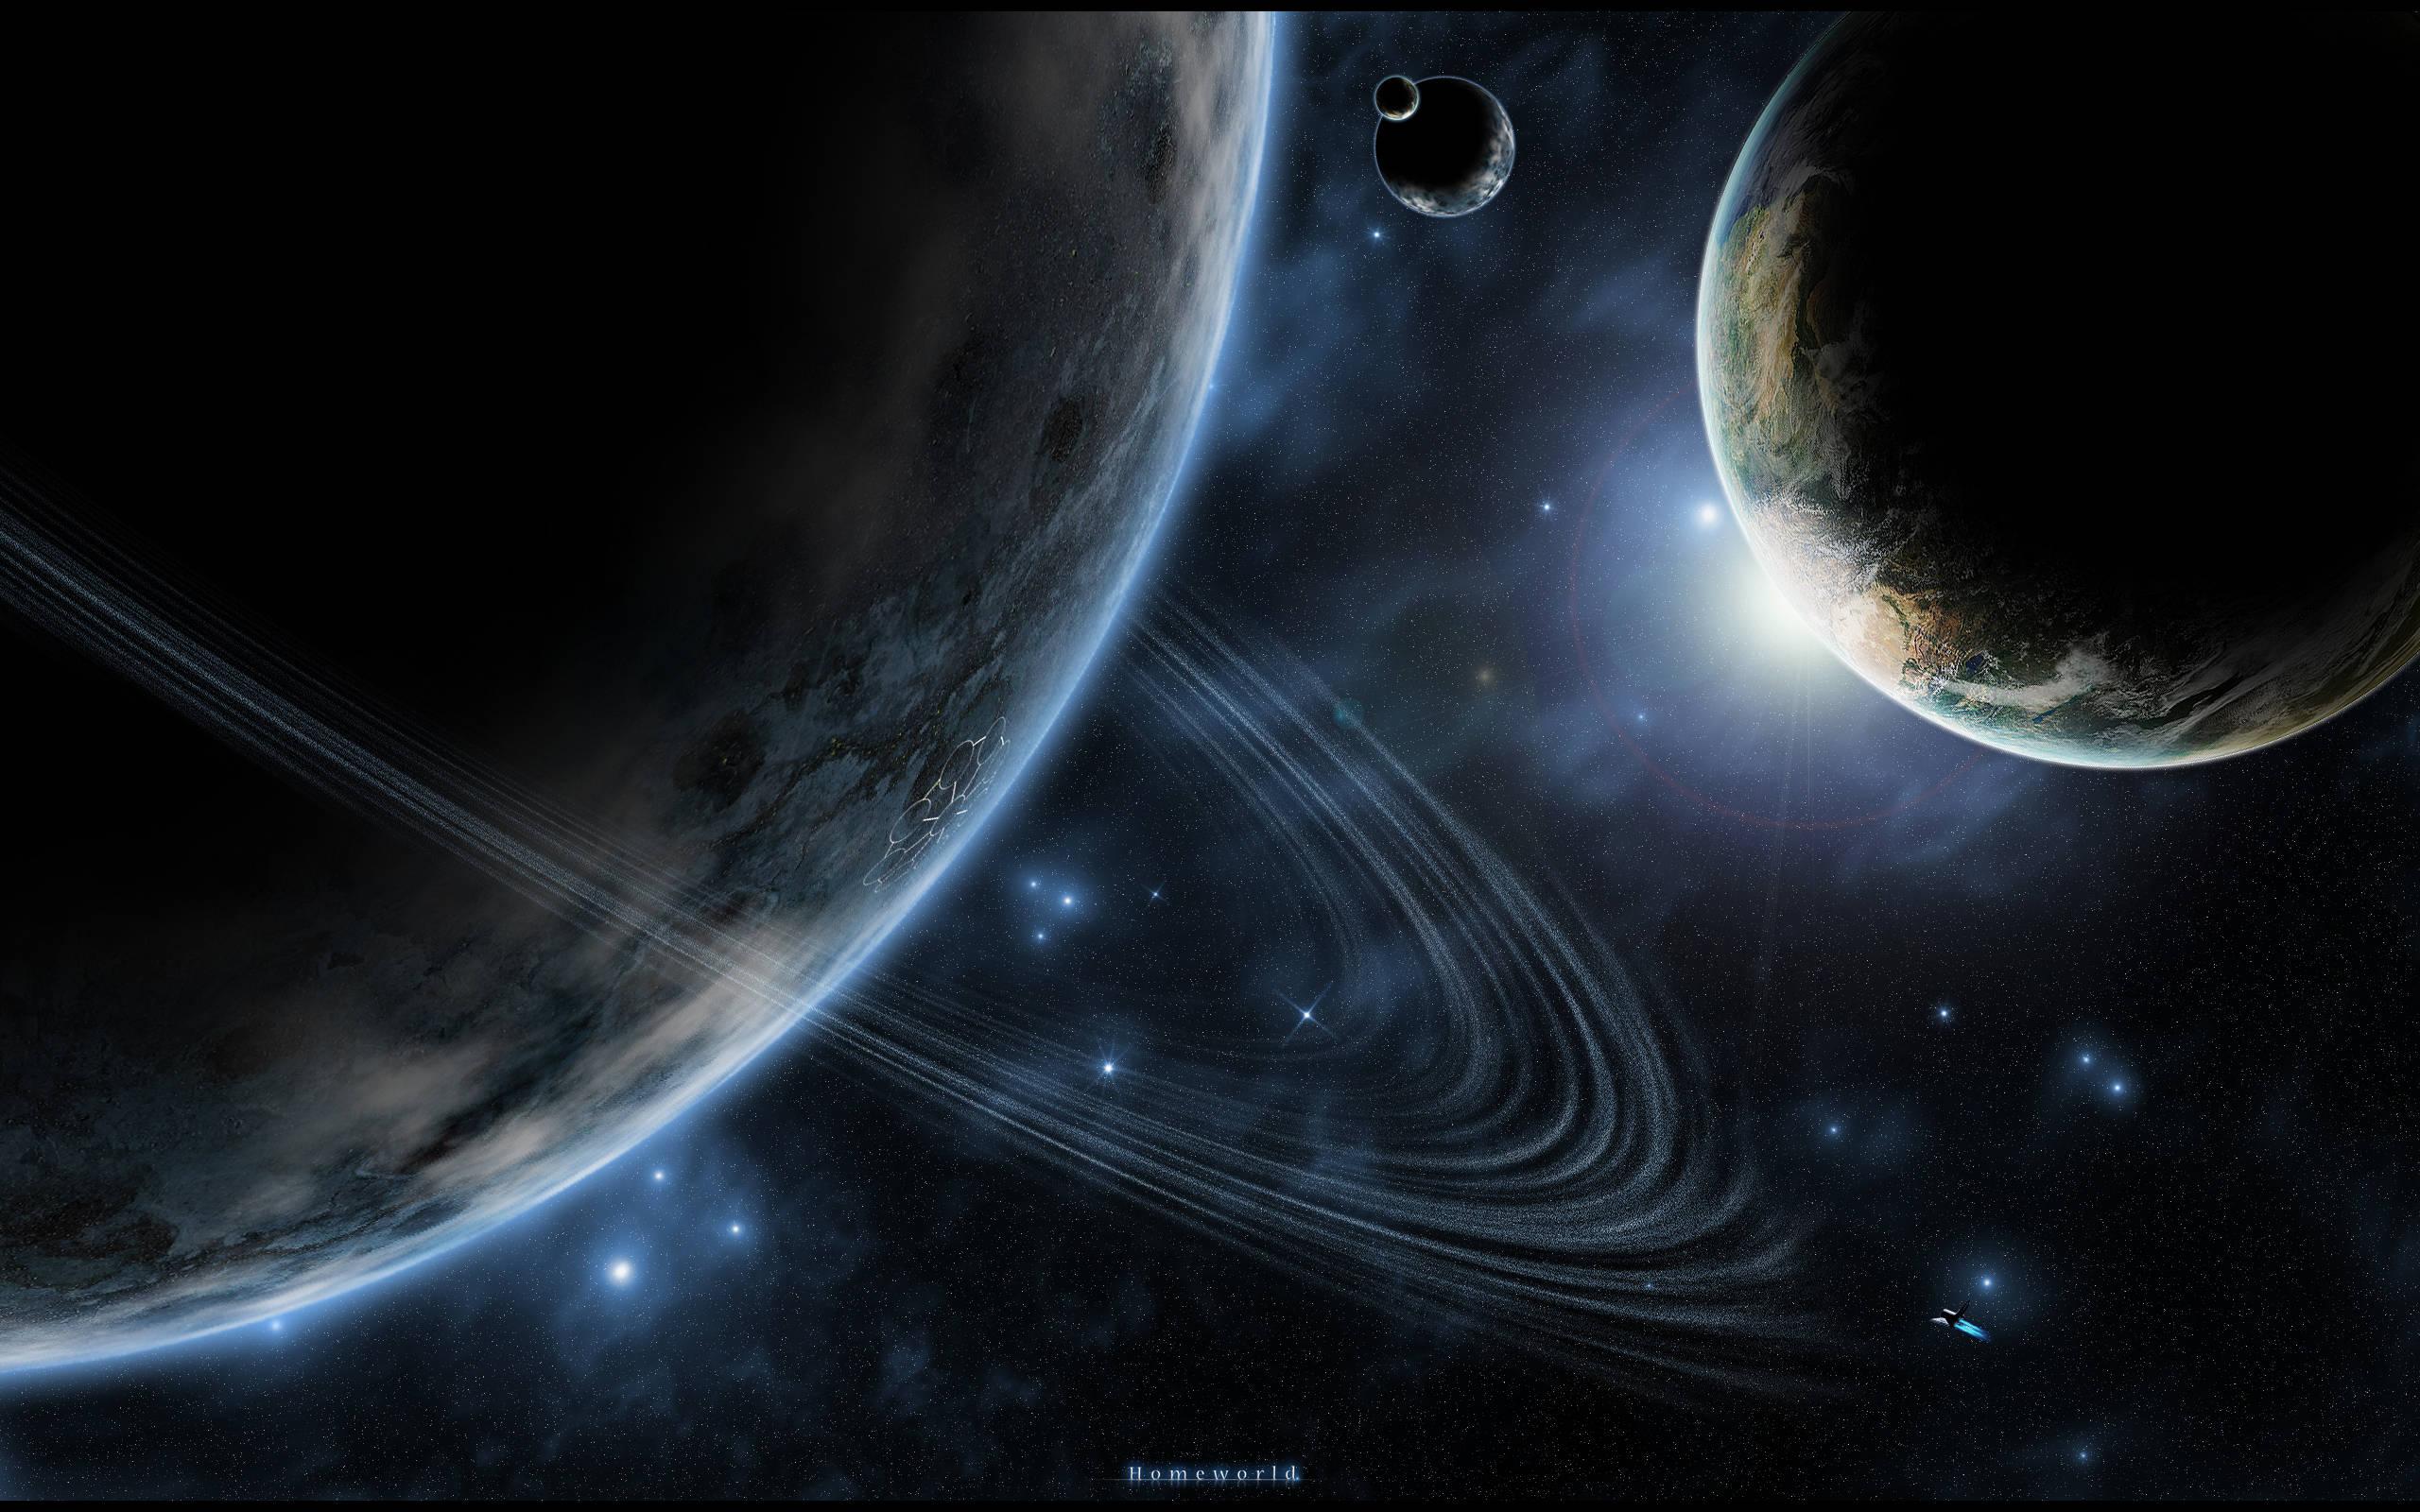 Картинки космоса и планет